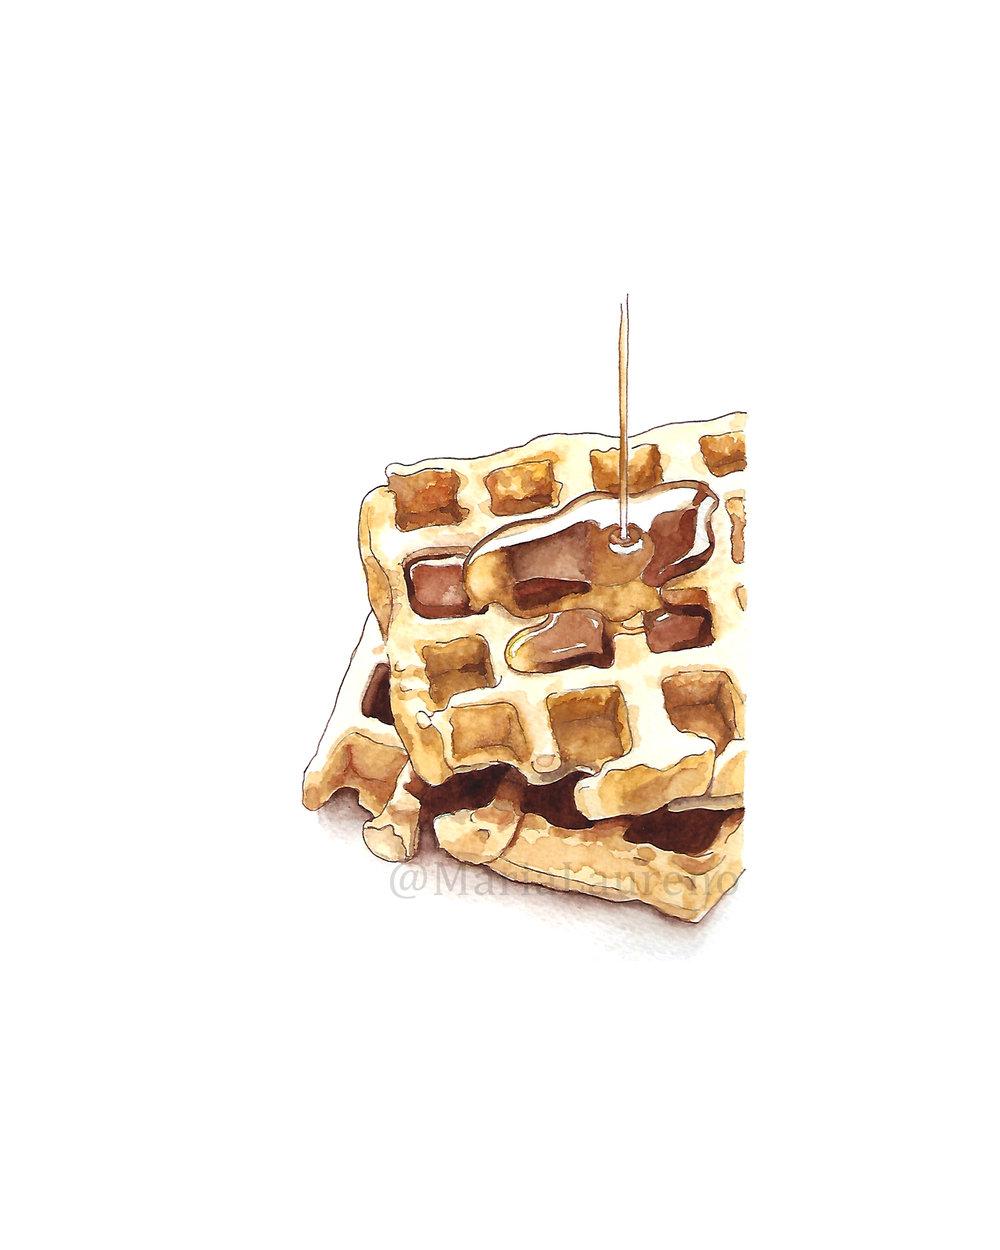 waffles 8x10.jpg